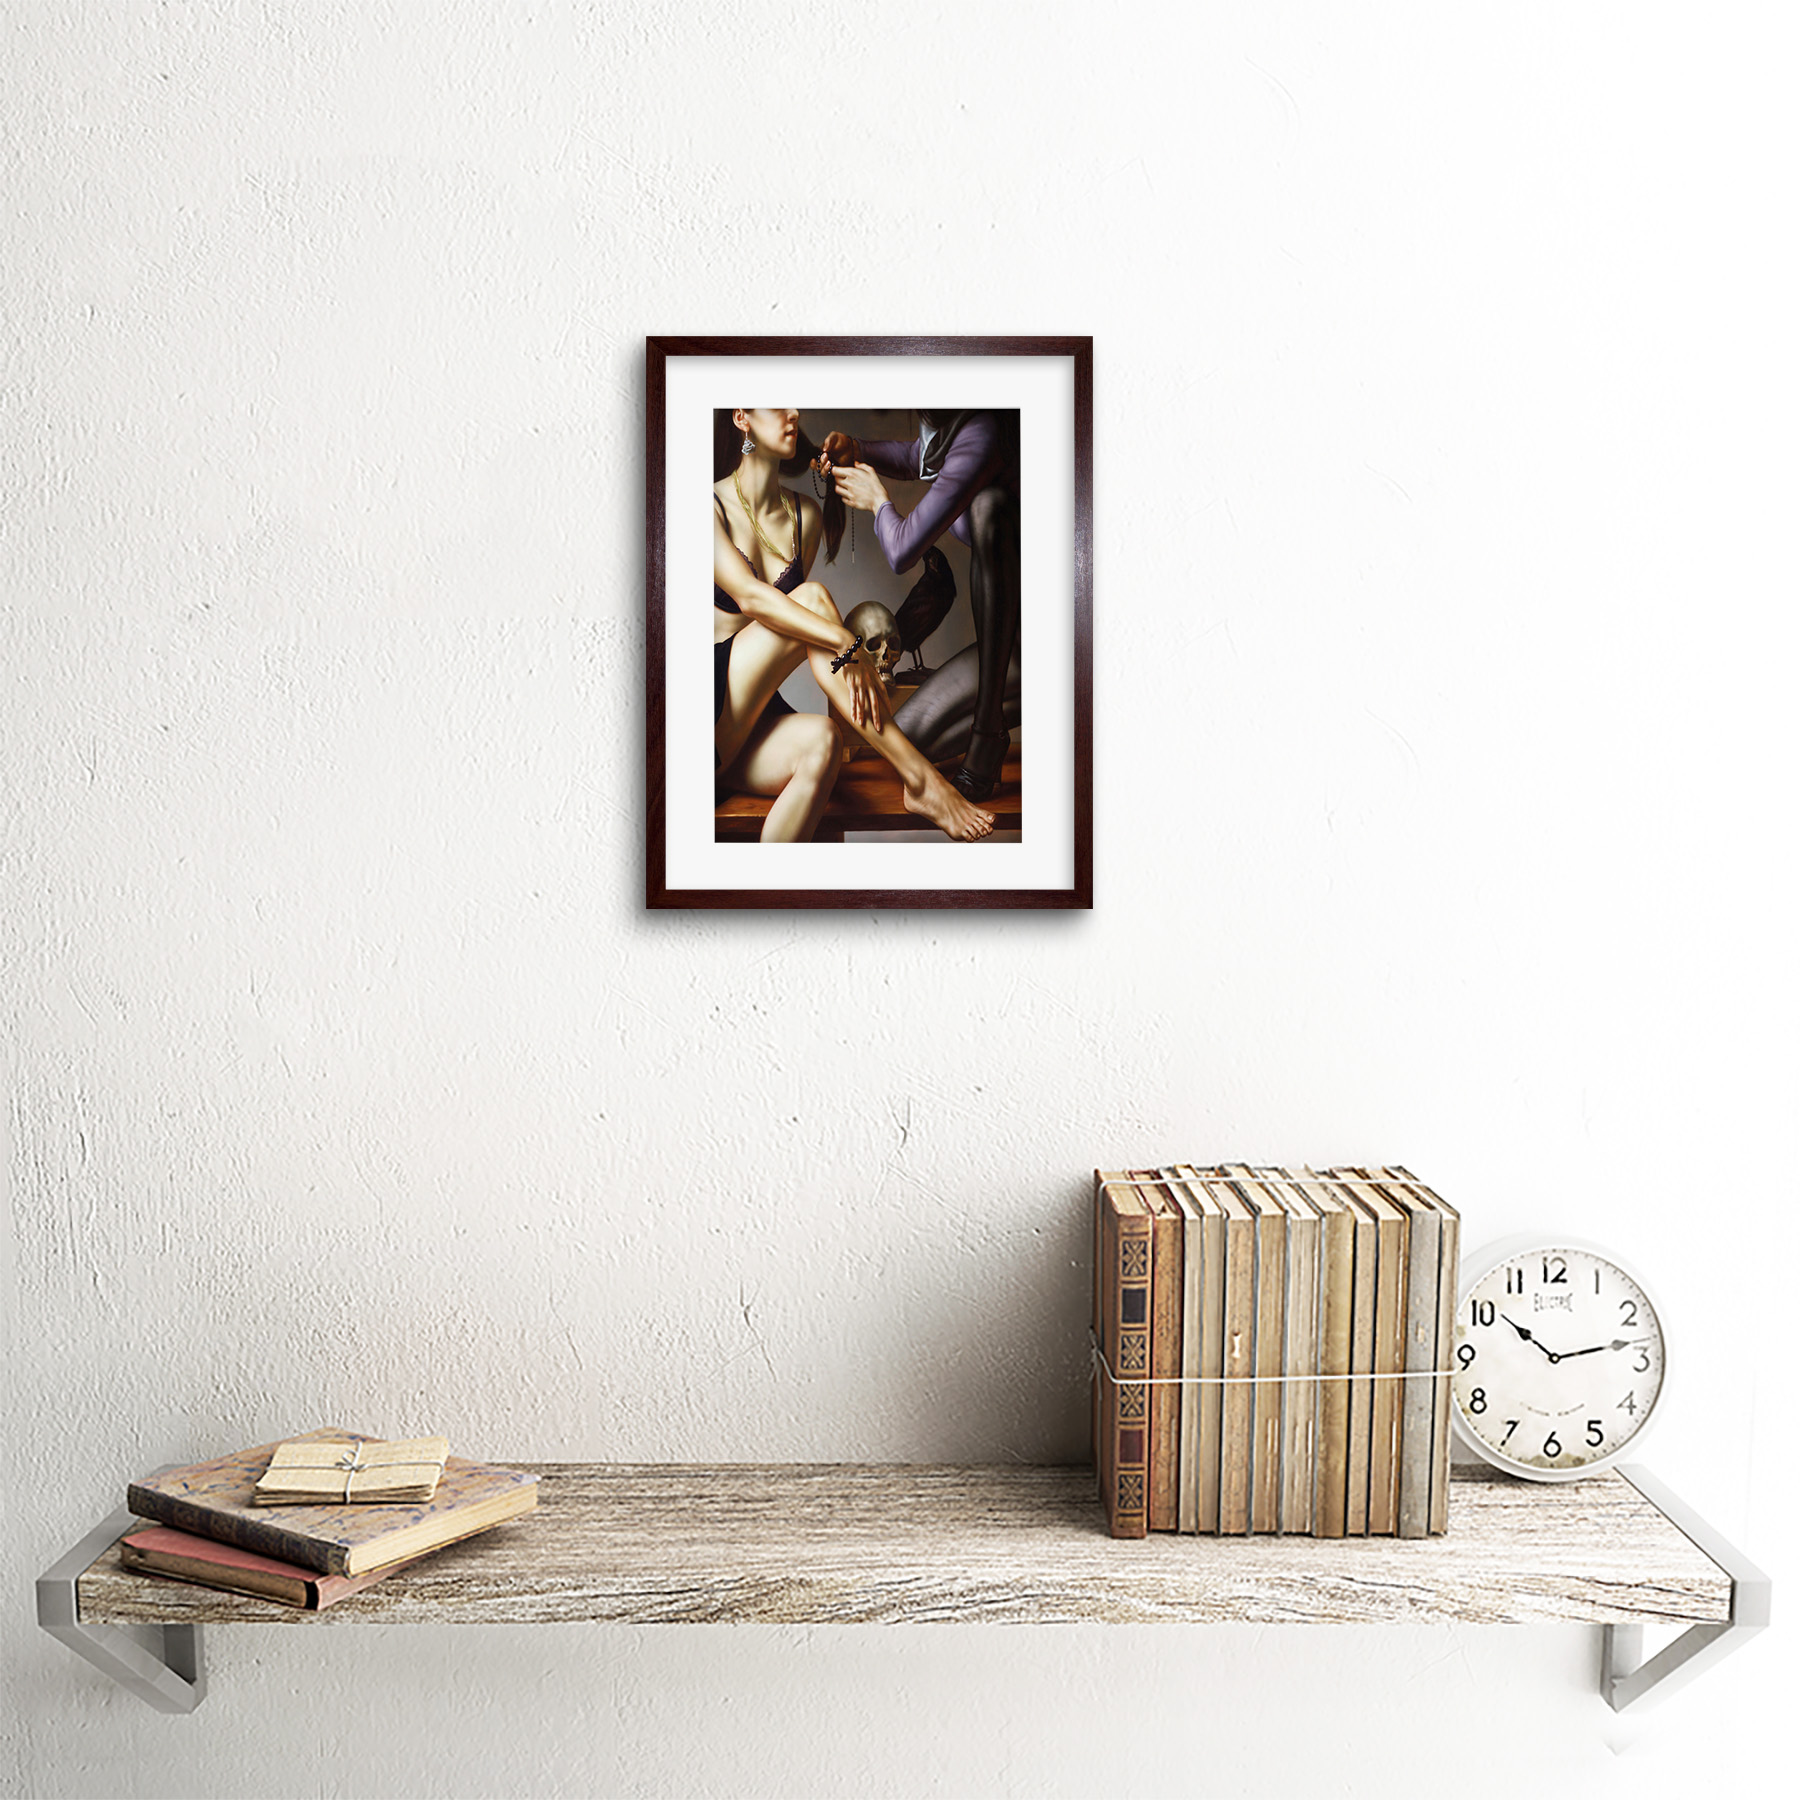 Painting-Balcar-Entering-Renaissance-Framed-Art-Print-9x7-Inch 縮圖 8